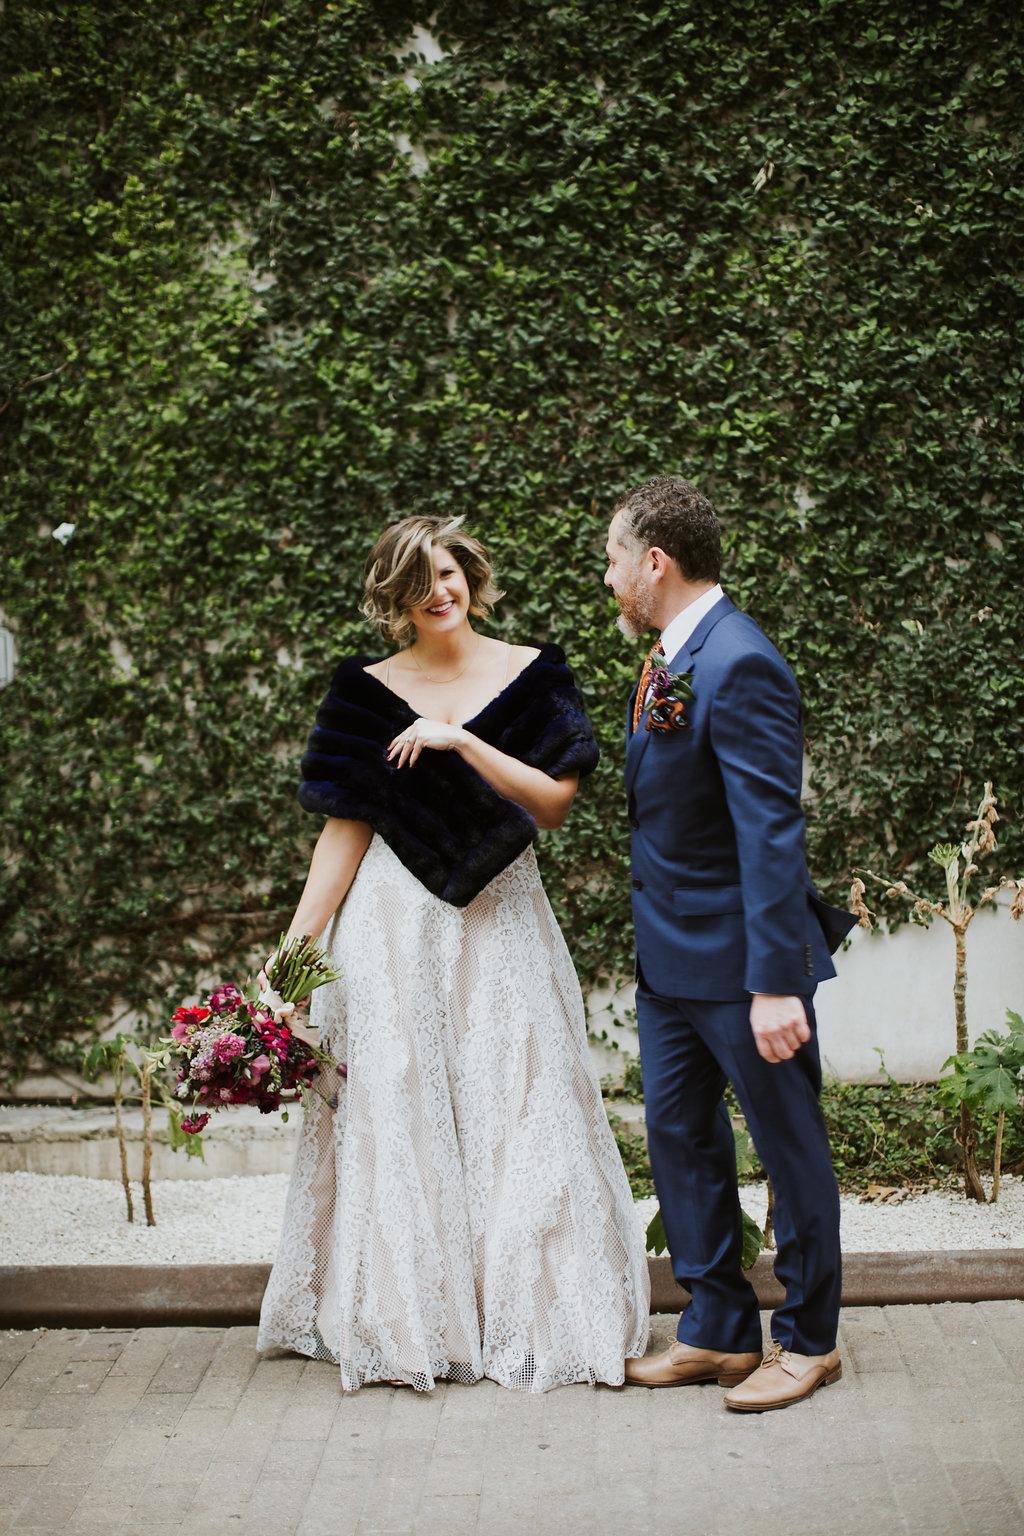 Paige-Newton-Intimate-Wedding-Photographer-Malverde-Wedding-Photography0029.jpg